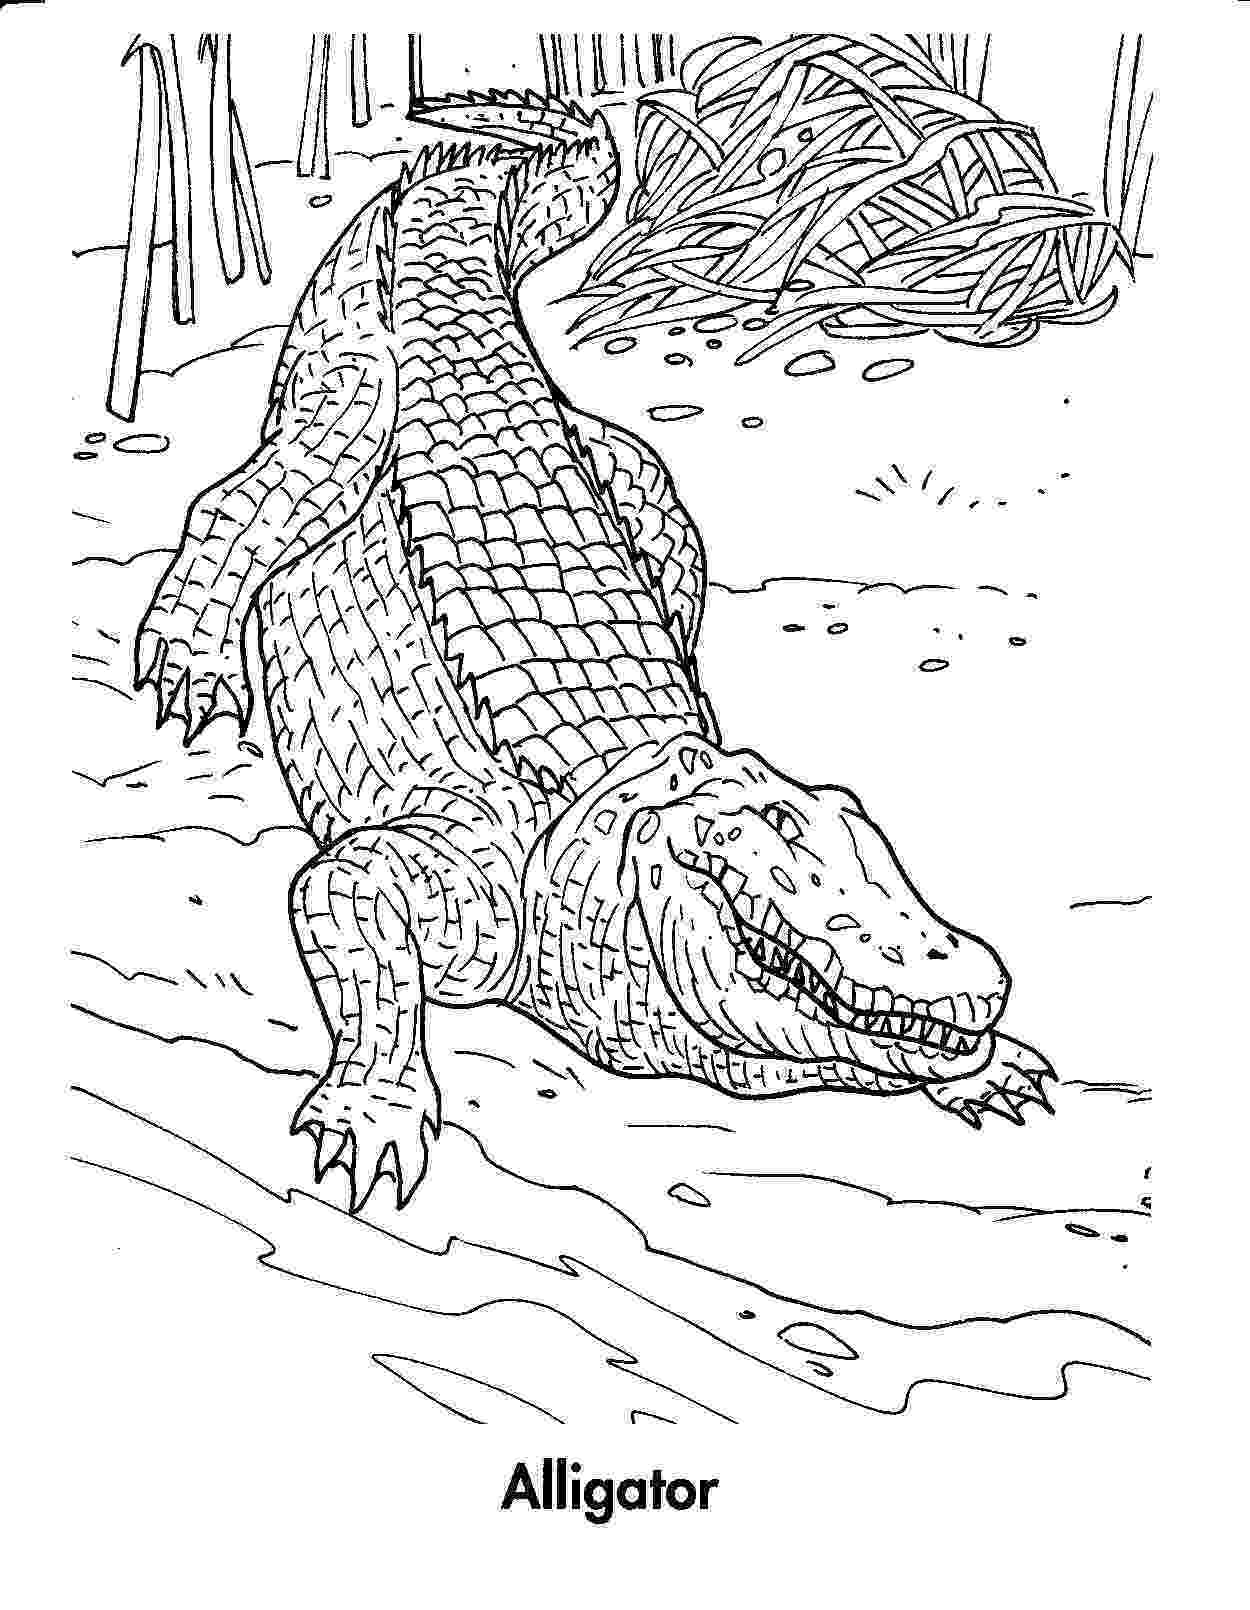 alligator coloring pages alligator coloring pages for kids pages coloring alligator